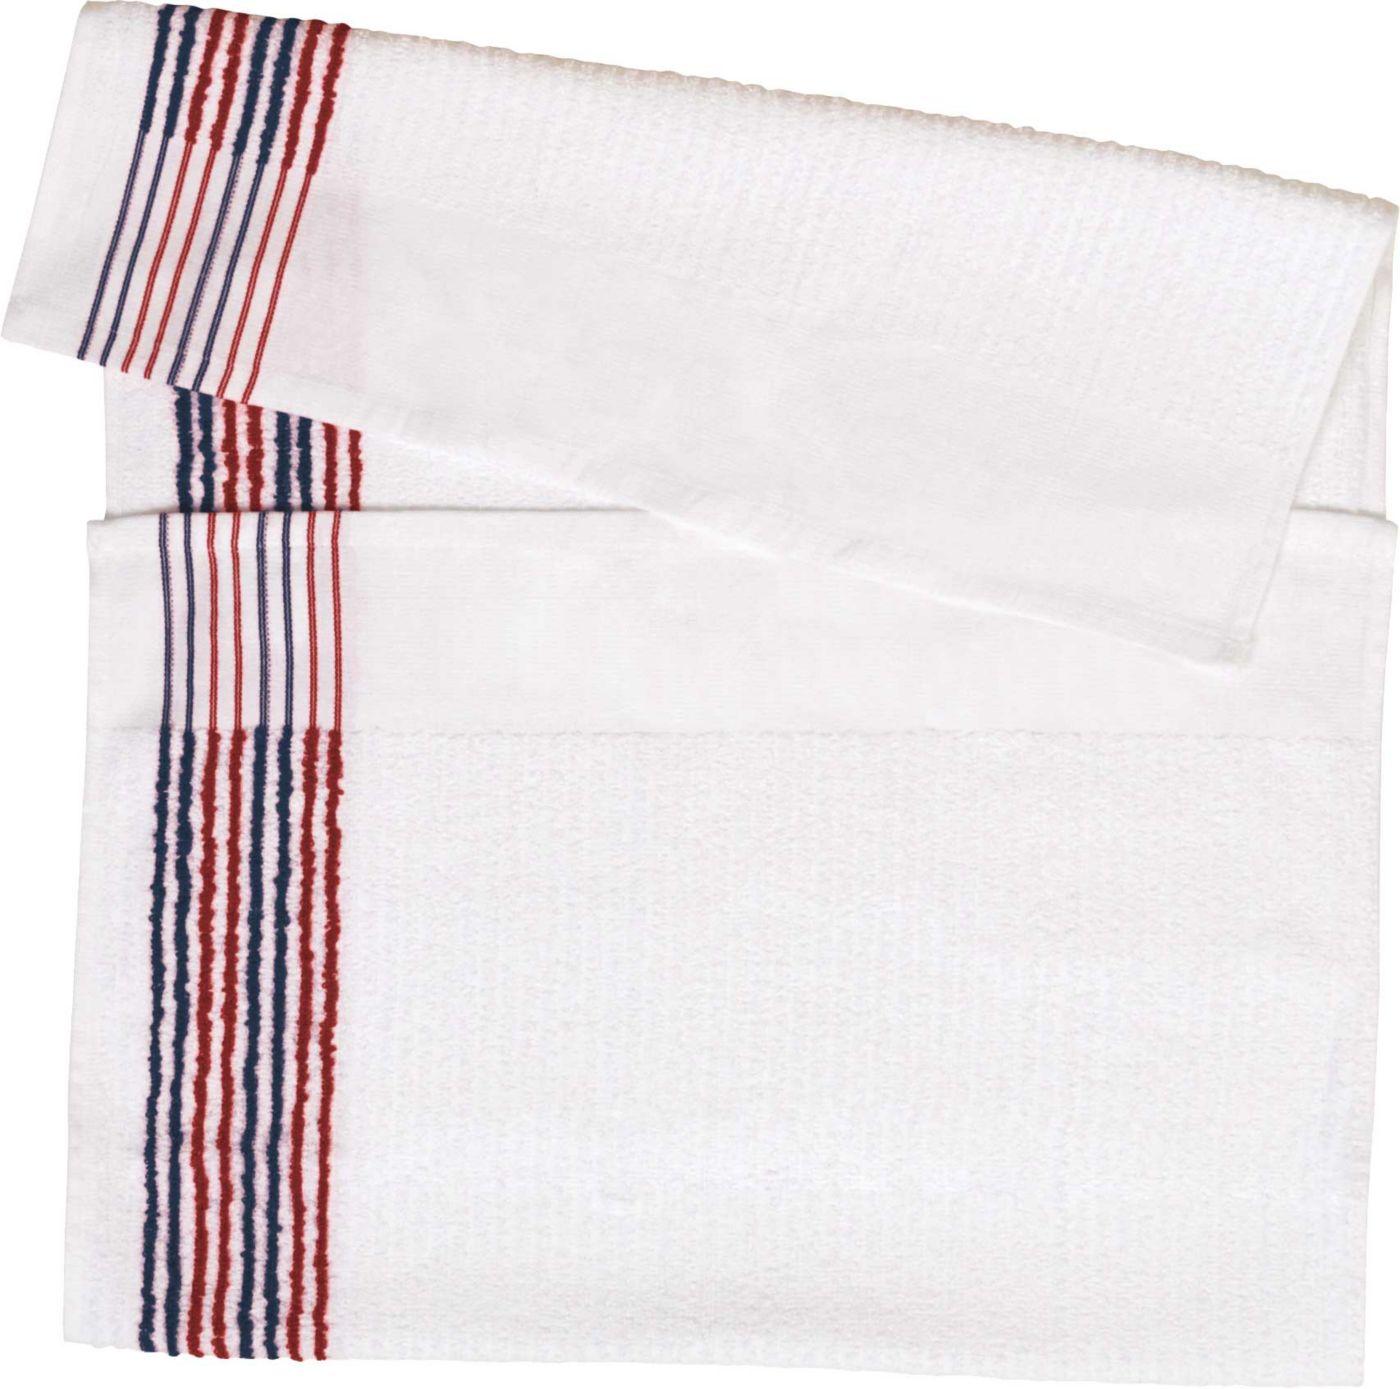 WinCraft Tour Caddy Golf Towel